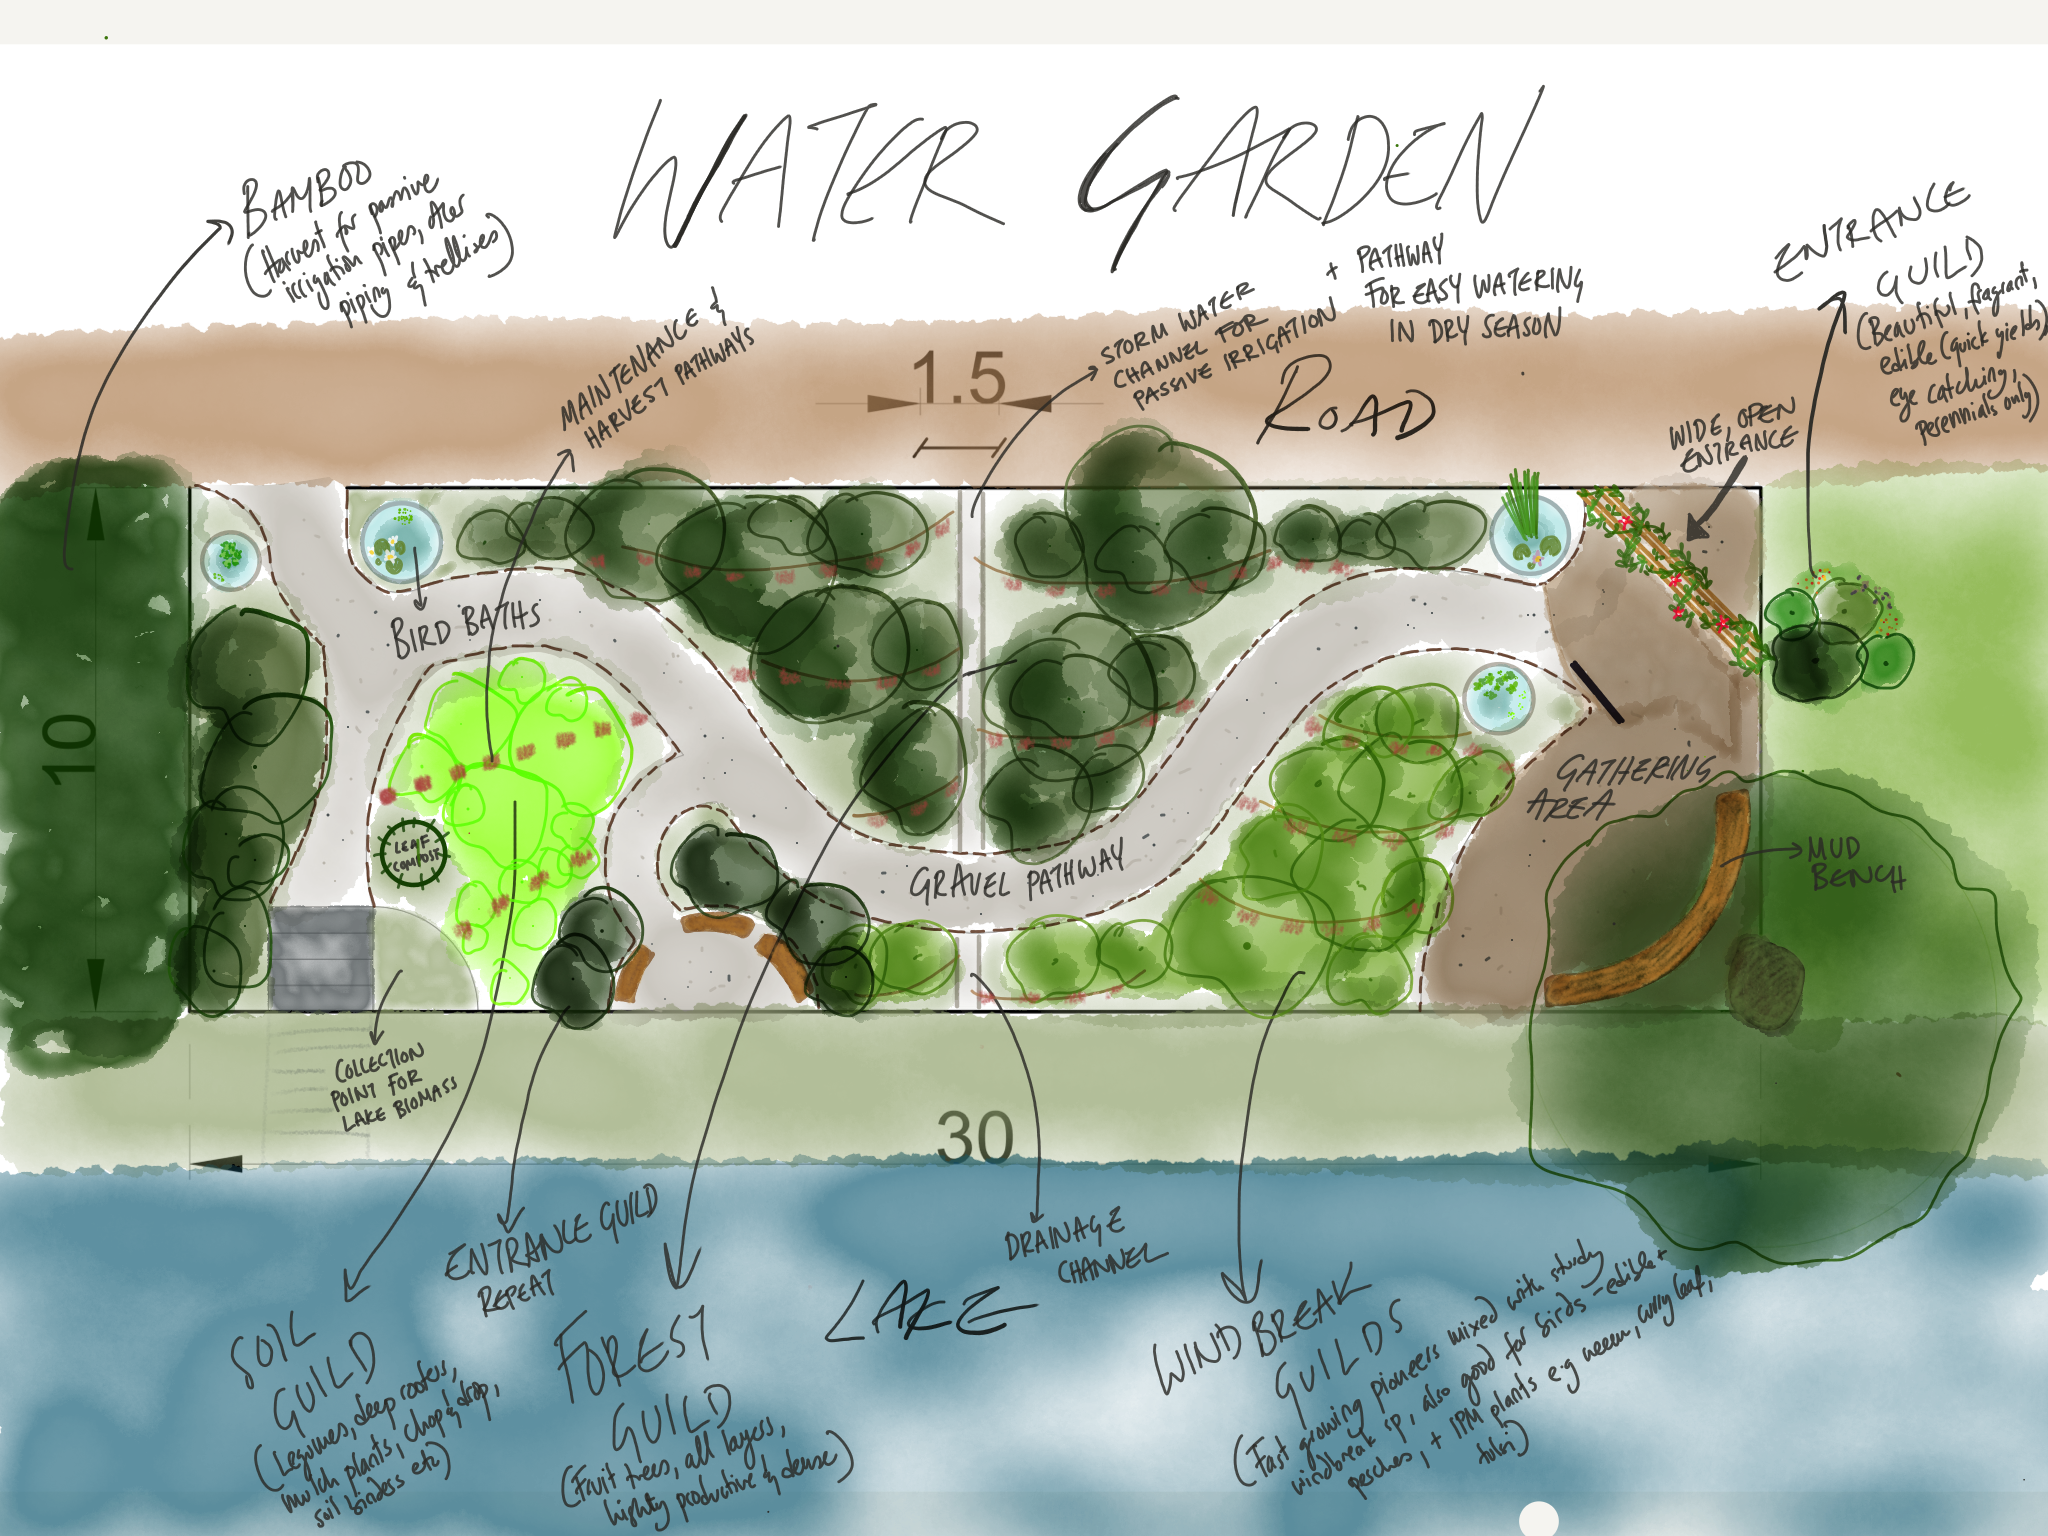 Jakkur Water Garden Drawing.png